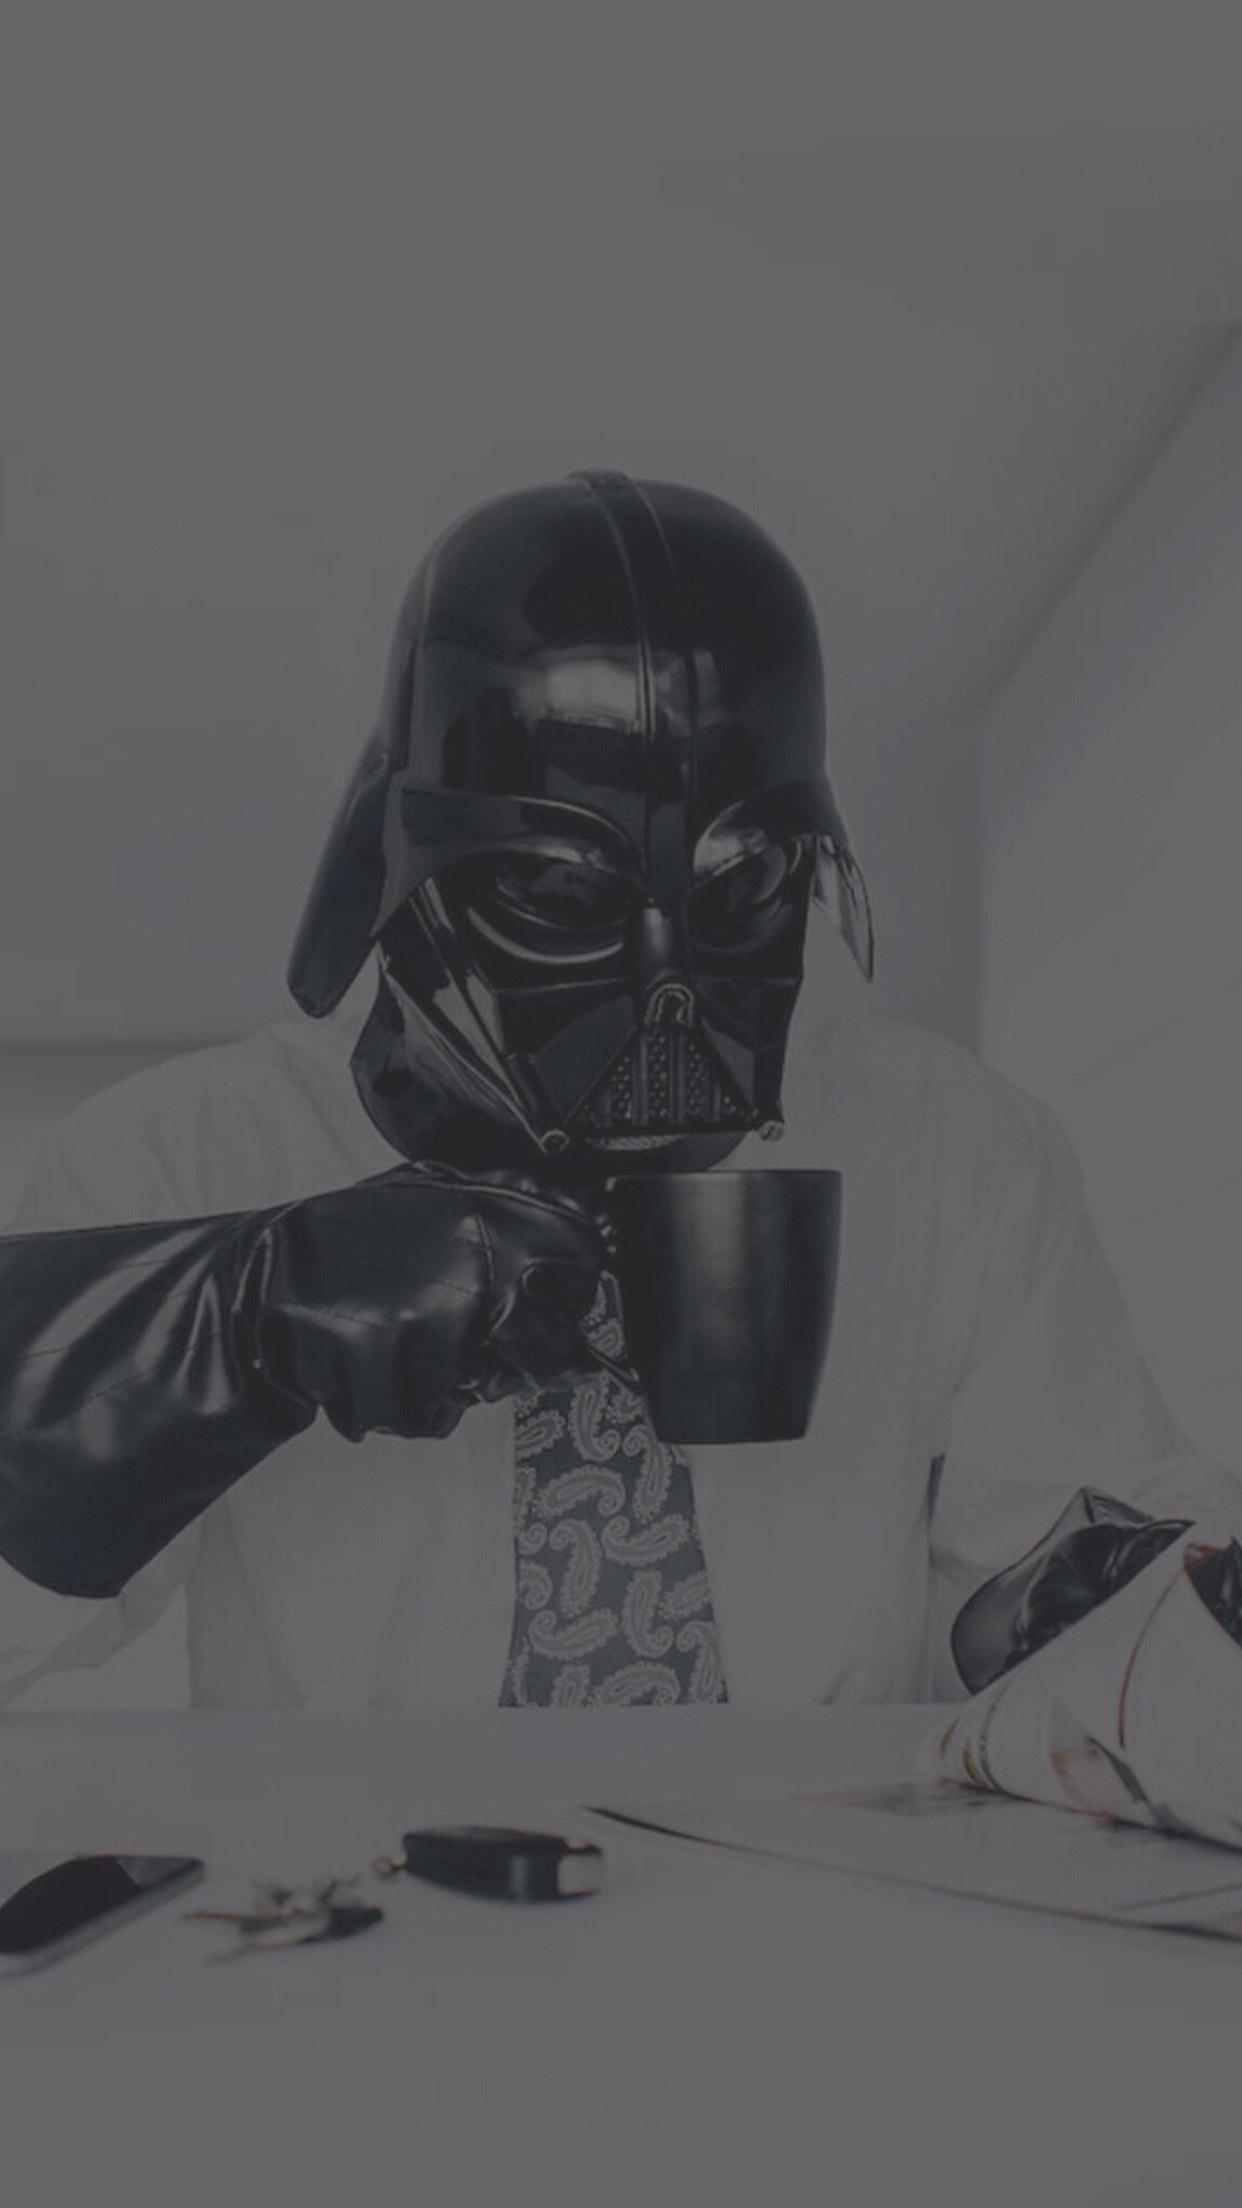 Star-Wars-iPhone-6-Wallpaper_06